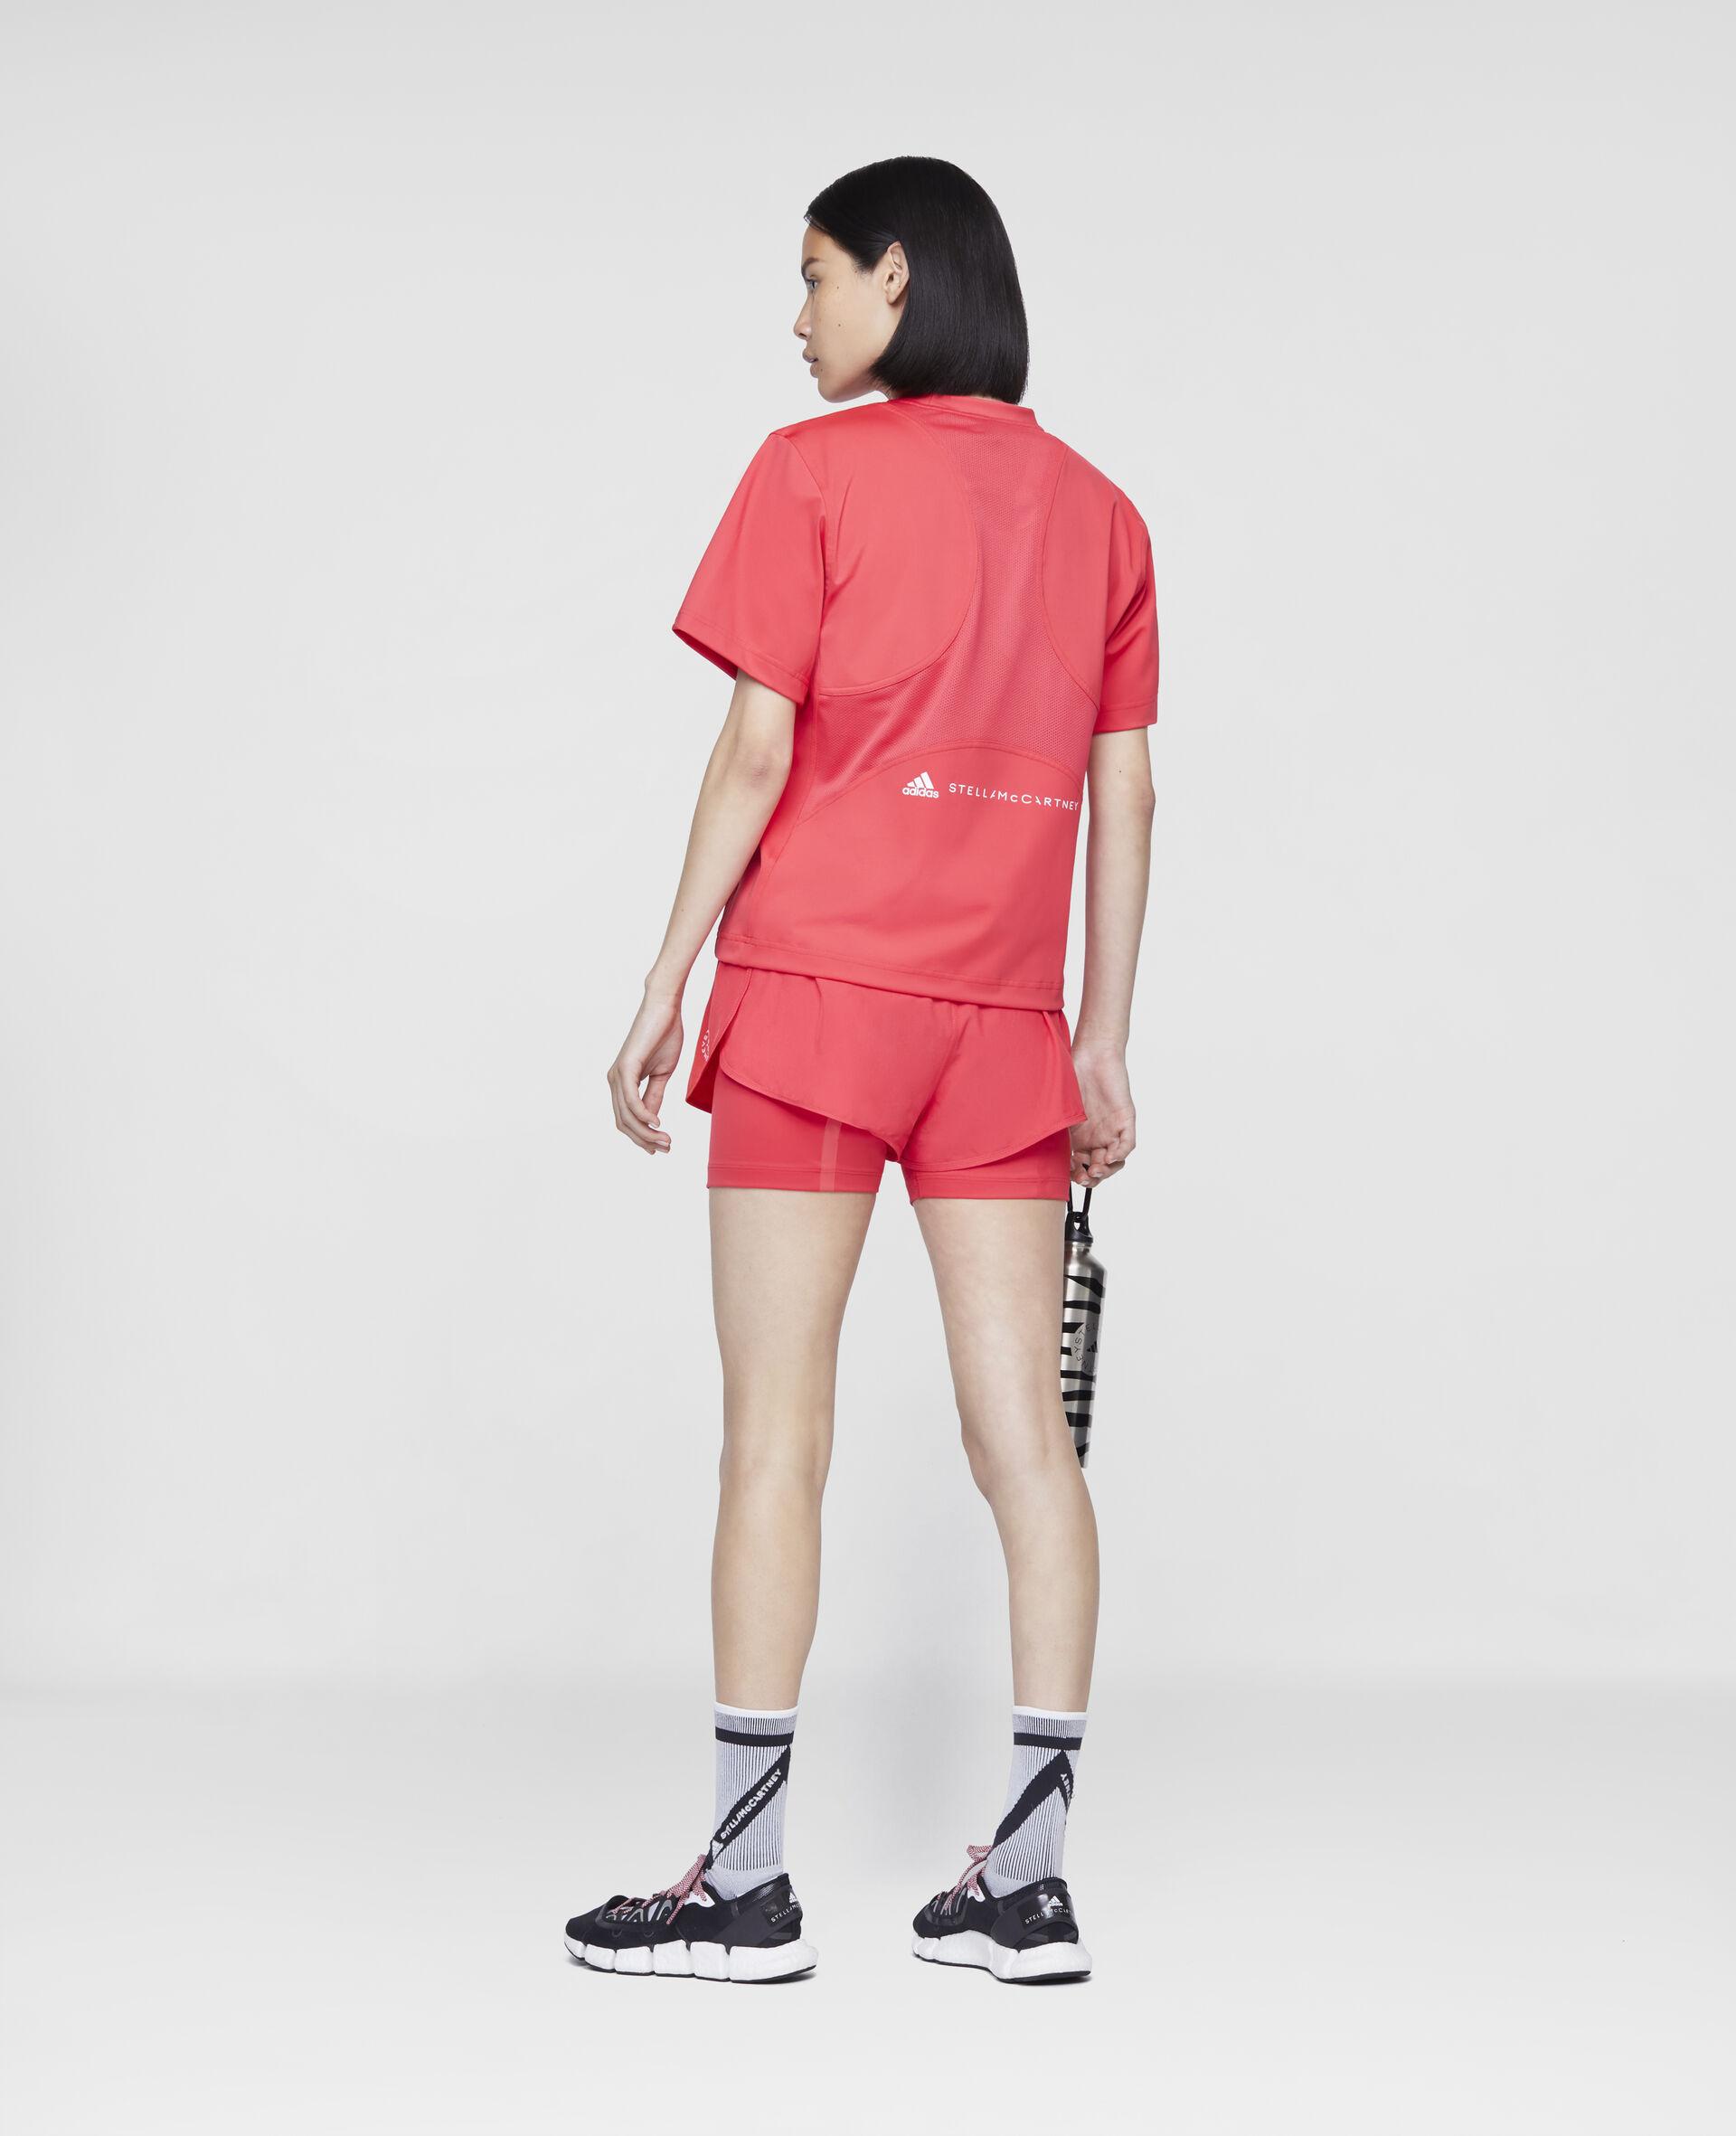 Rosa TruePurpose Trainings-Shorts-Rose-large image number 2